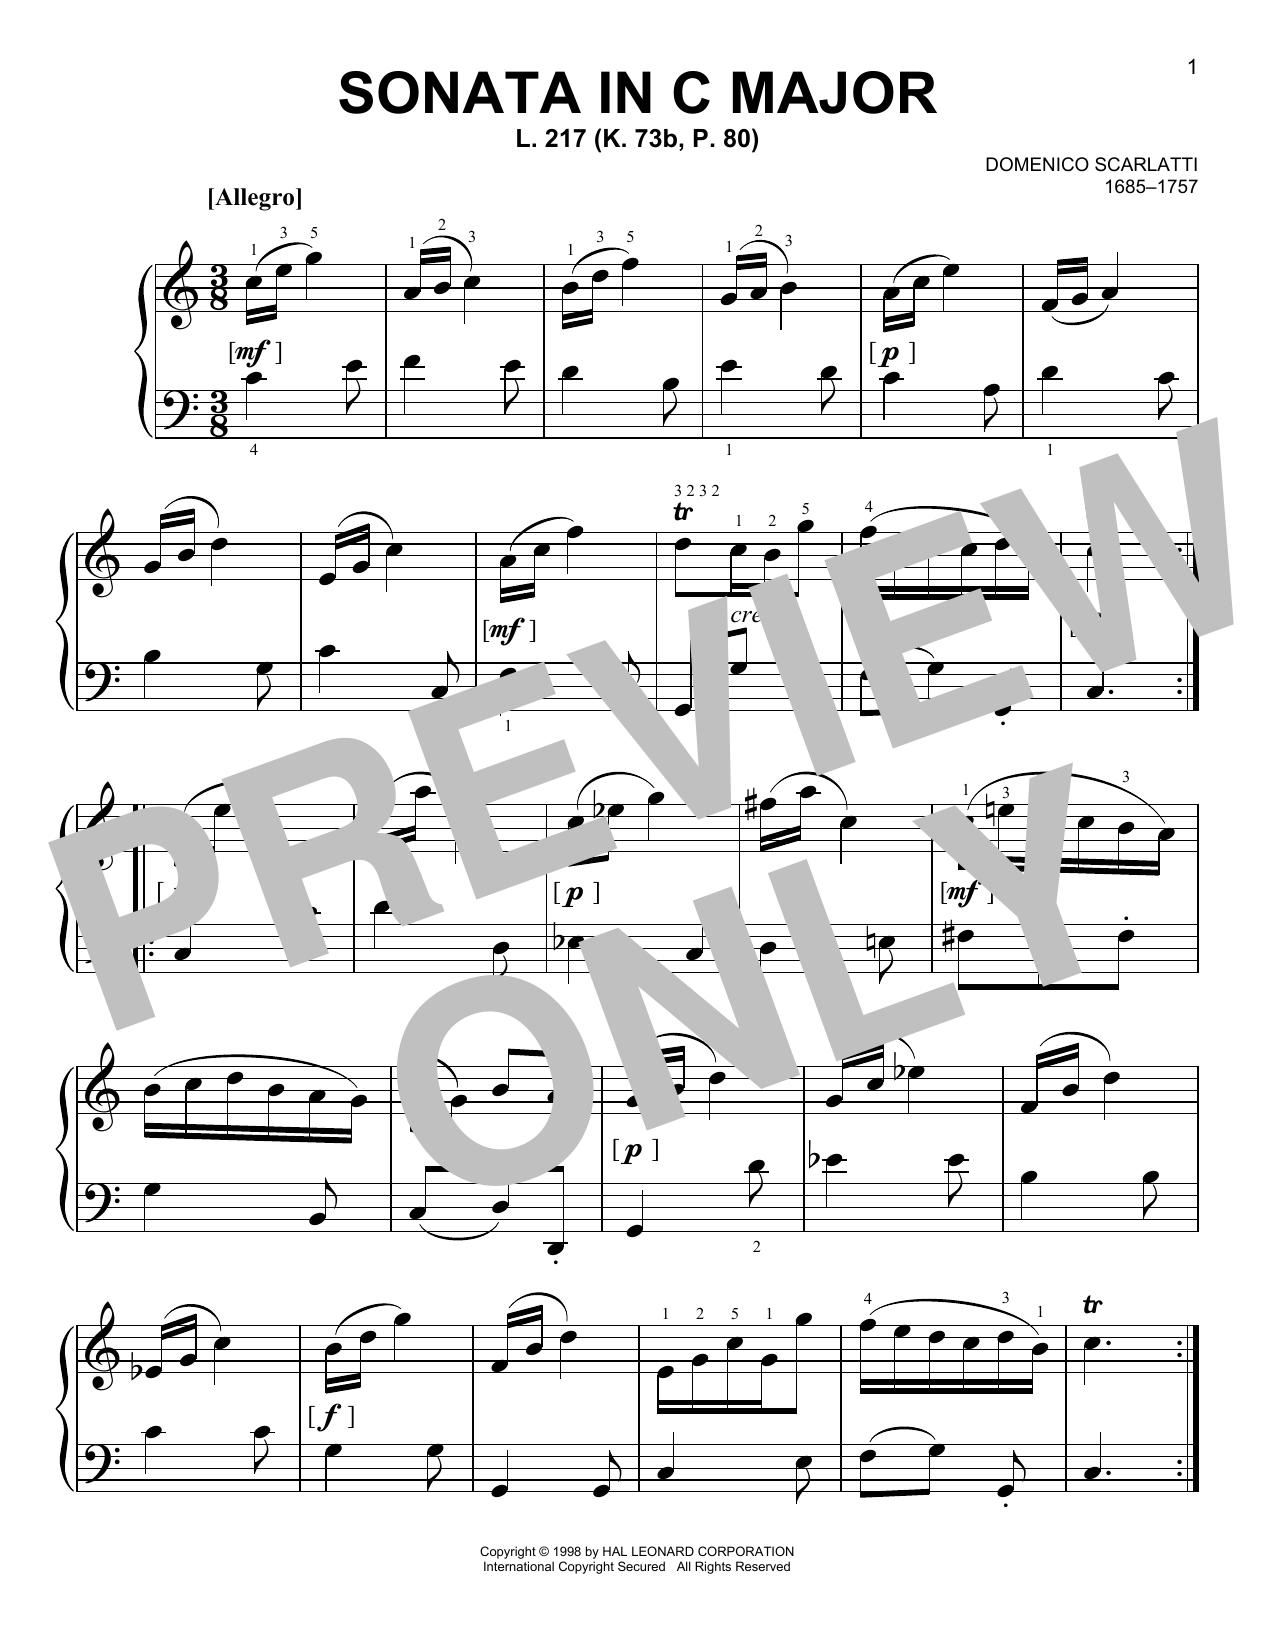 Sonata In C Major, L. 217 (Easy Piano)